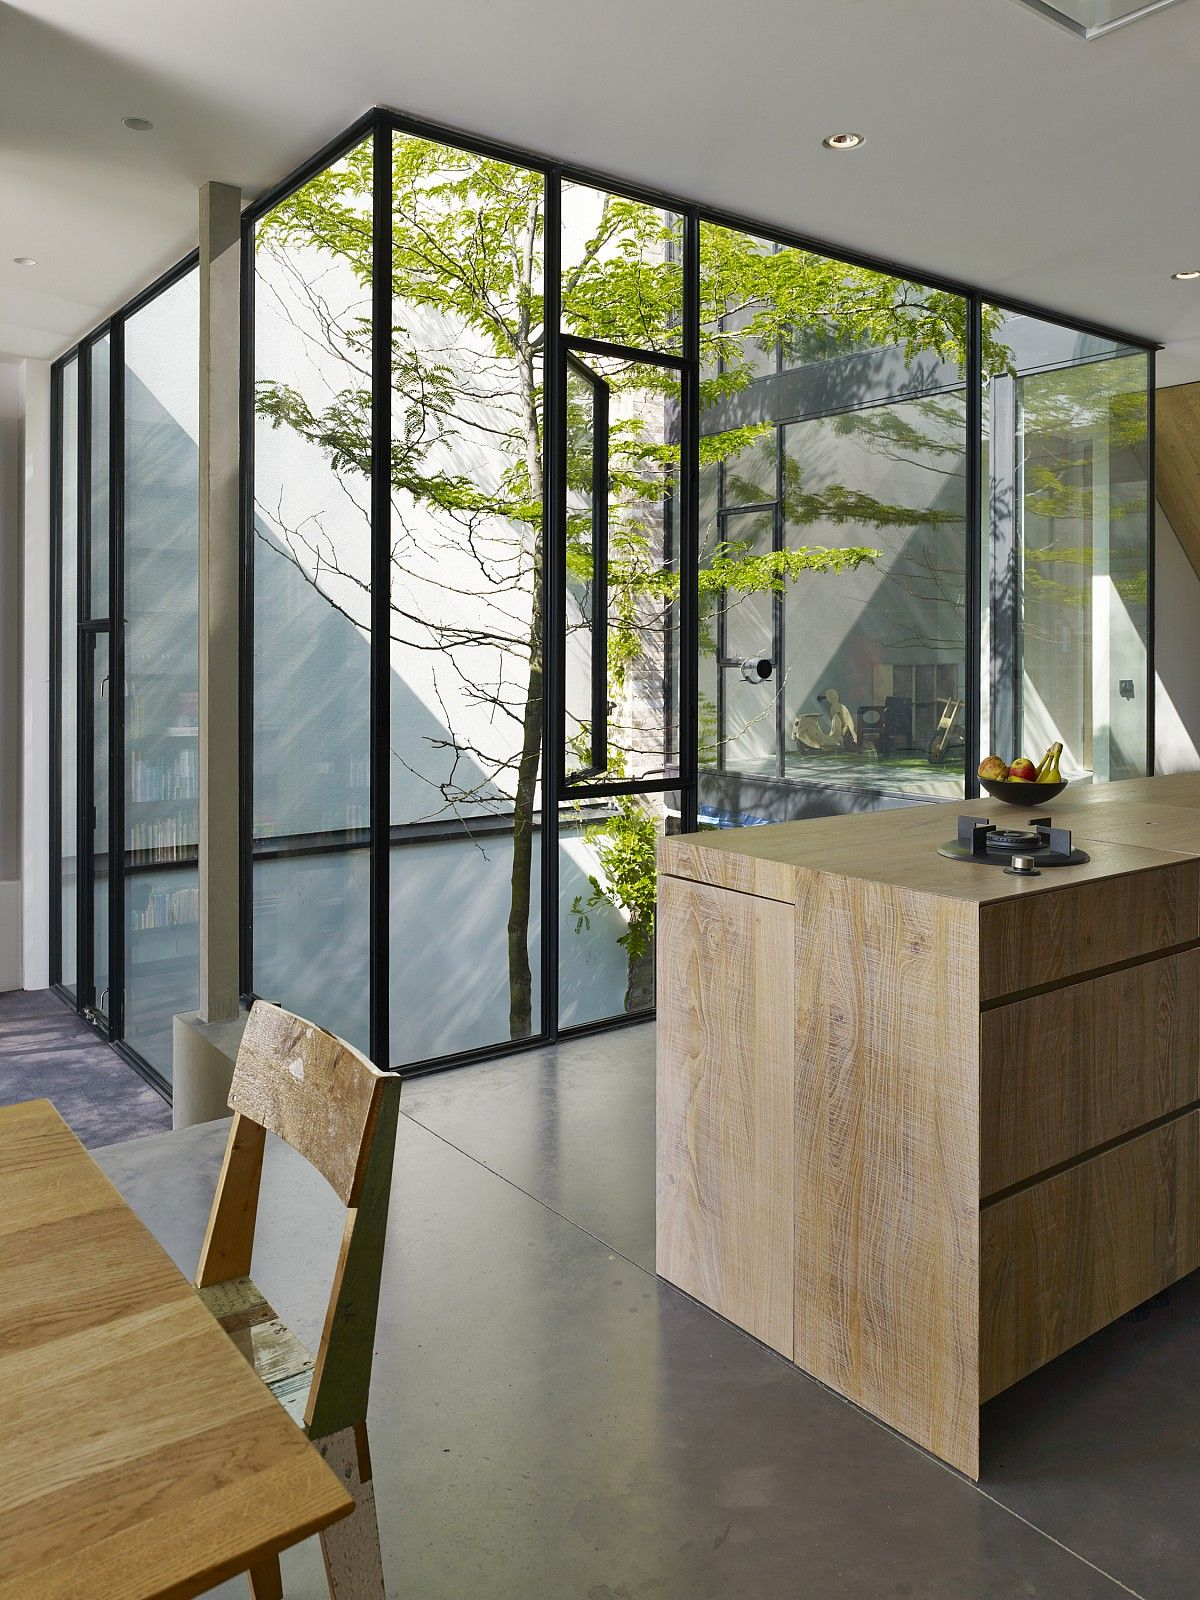 Internal Affairs Interior Designers: Private House On Rieteiland